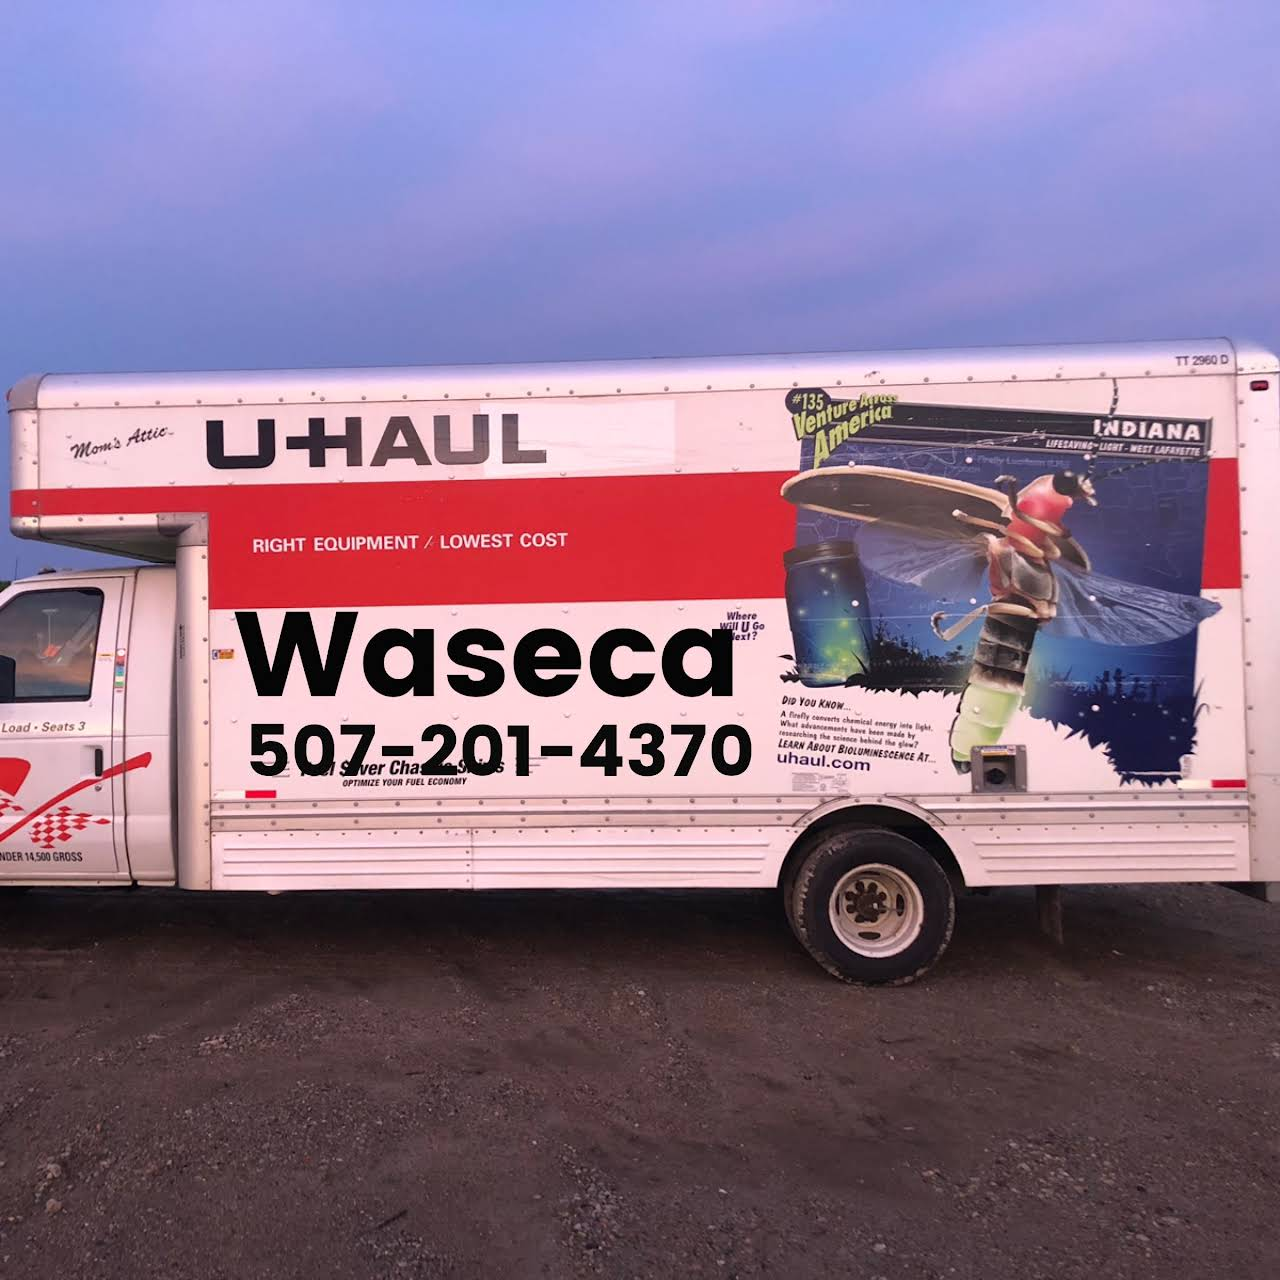 Waseca U Haul - Waseca U Haul is, open 7 days a week with a wide